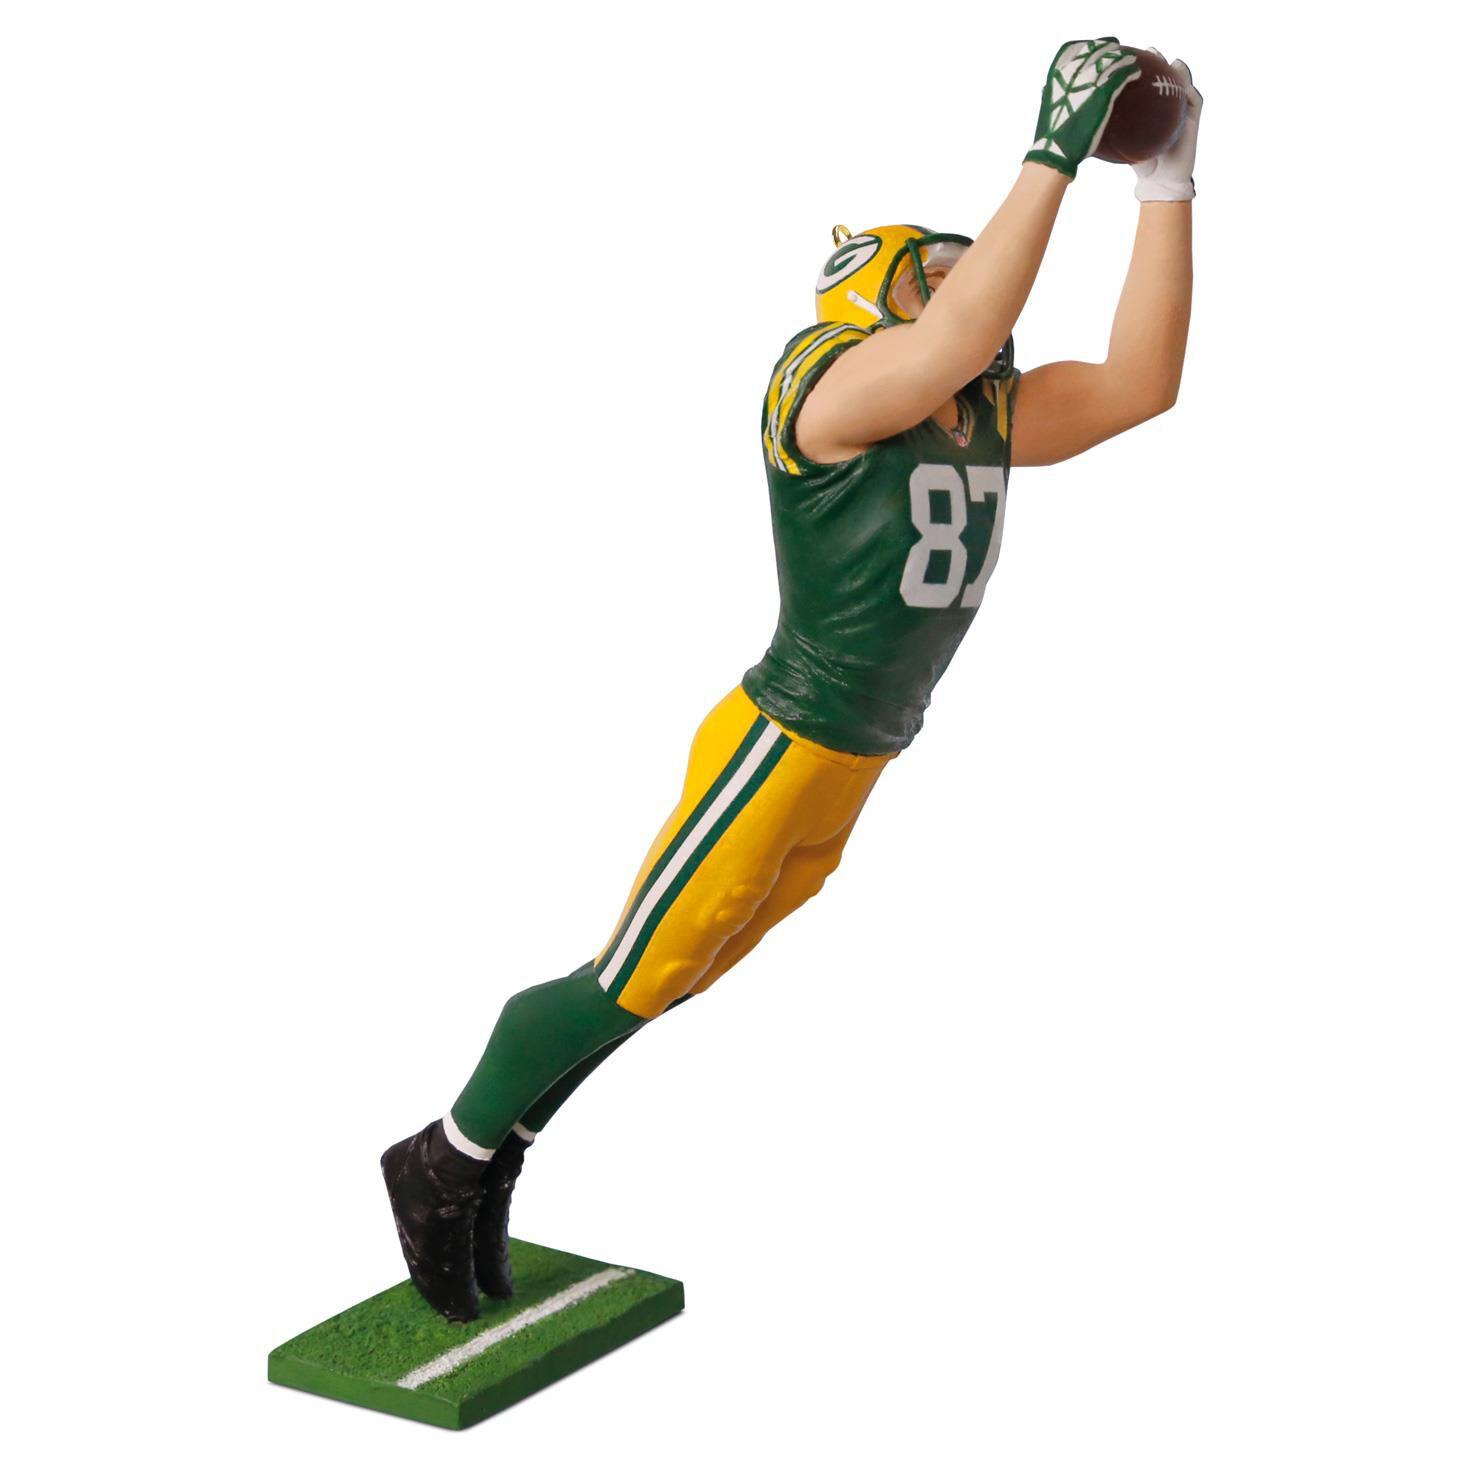 Football player ornament - Nfl Green Bay Packers Jordy Nelson Ornament Keepsake Ornaments Hallmark